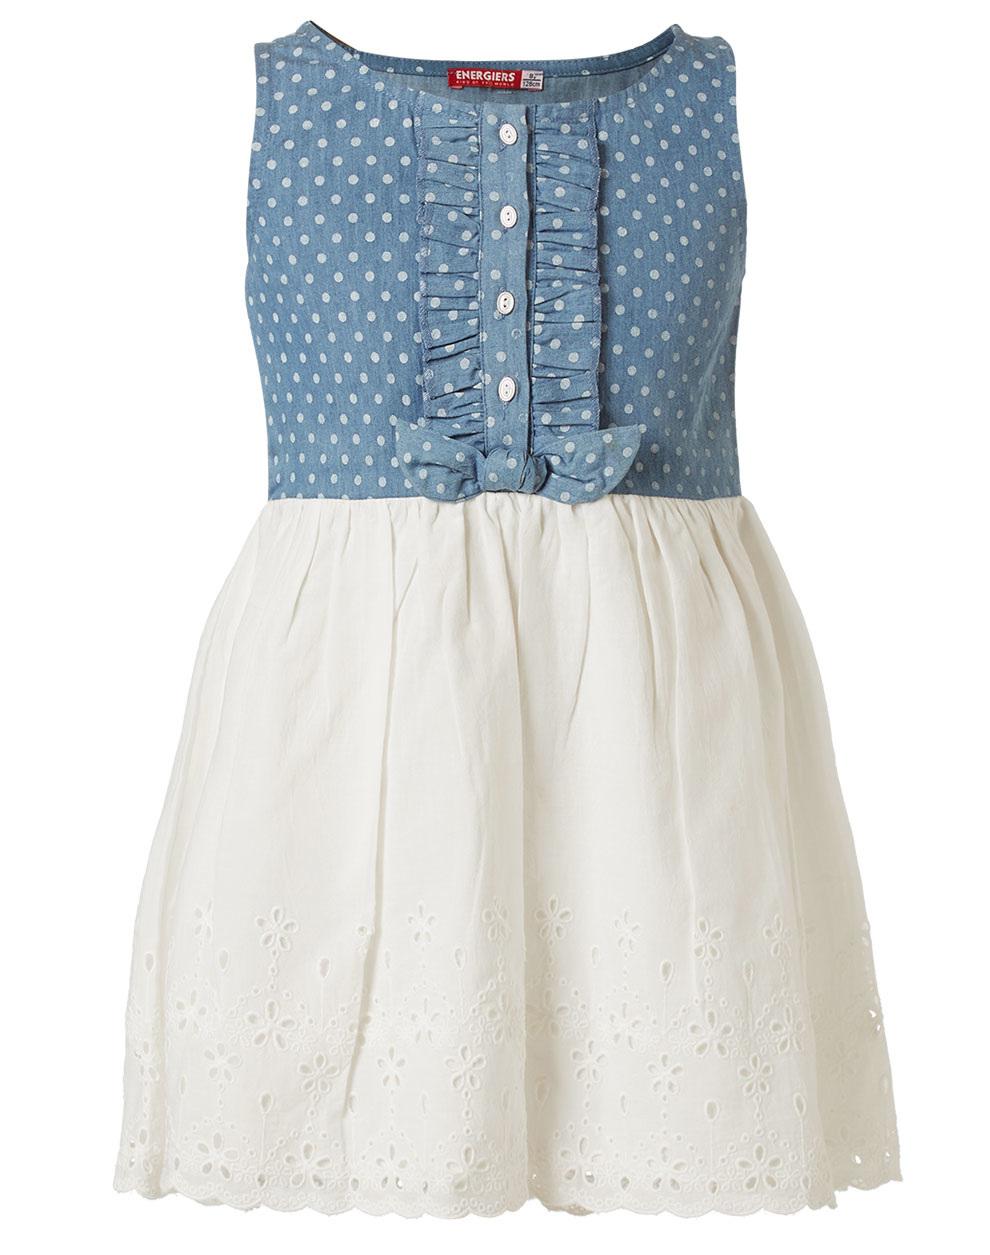 2774d0094ea Παιδικές φούστες - φορέματα | energiers (Ταξινόμηση: Ακριβότερα ...